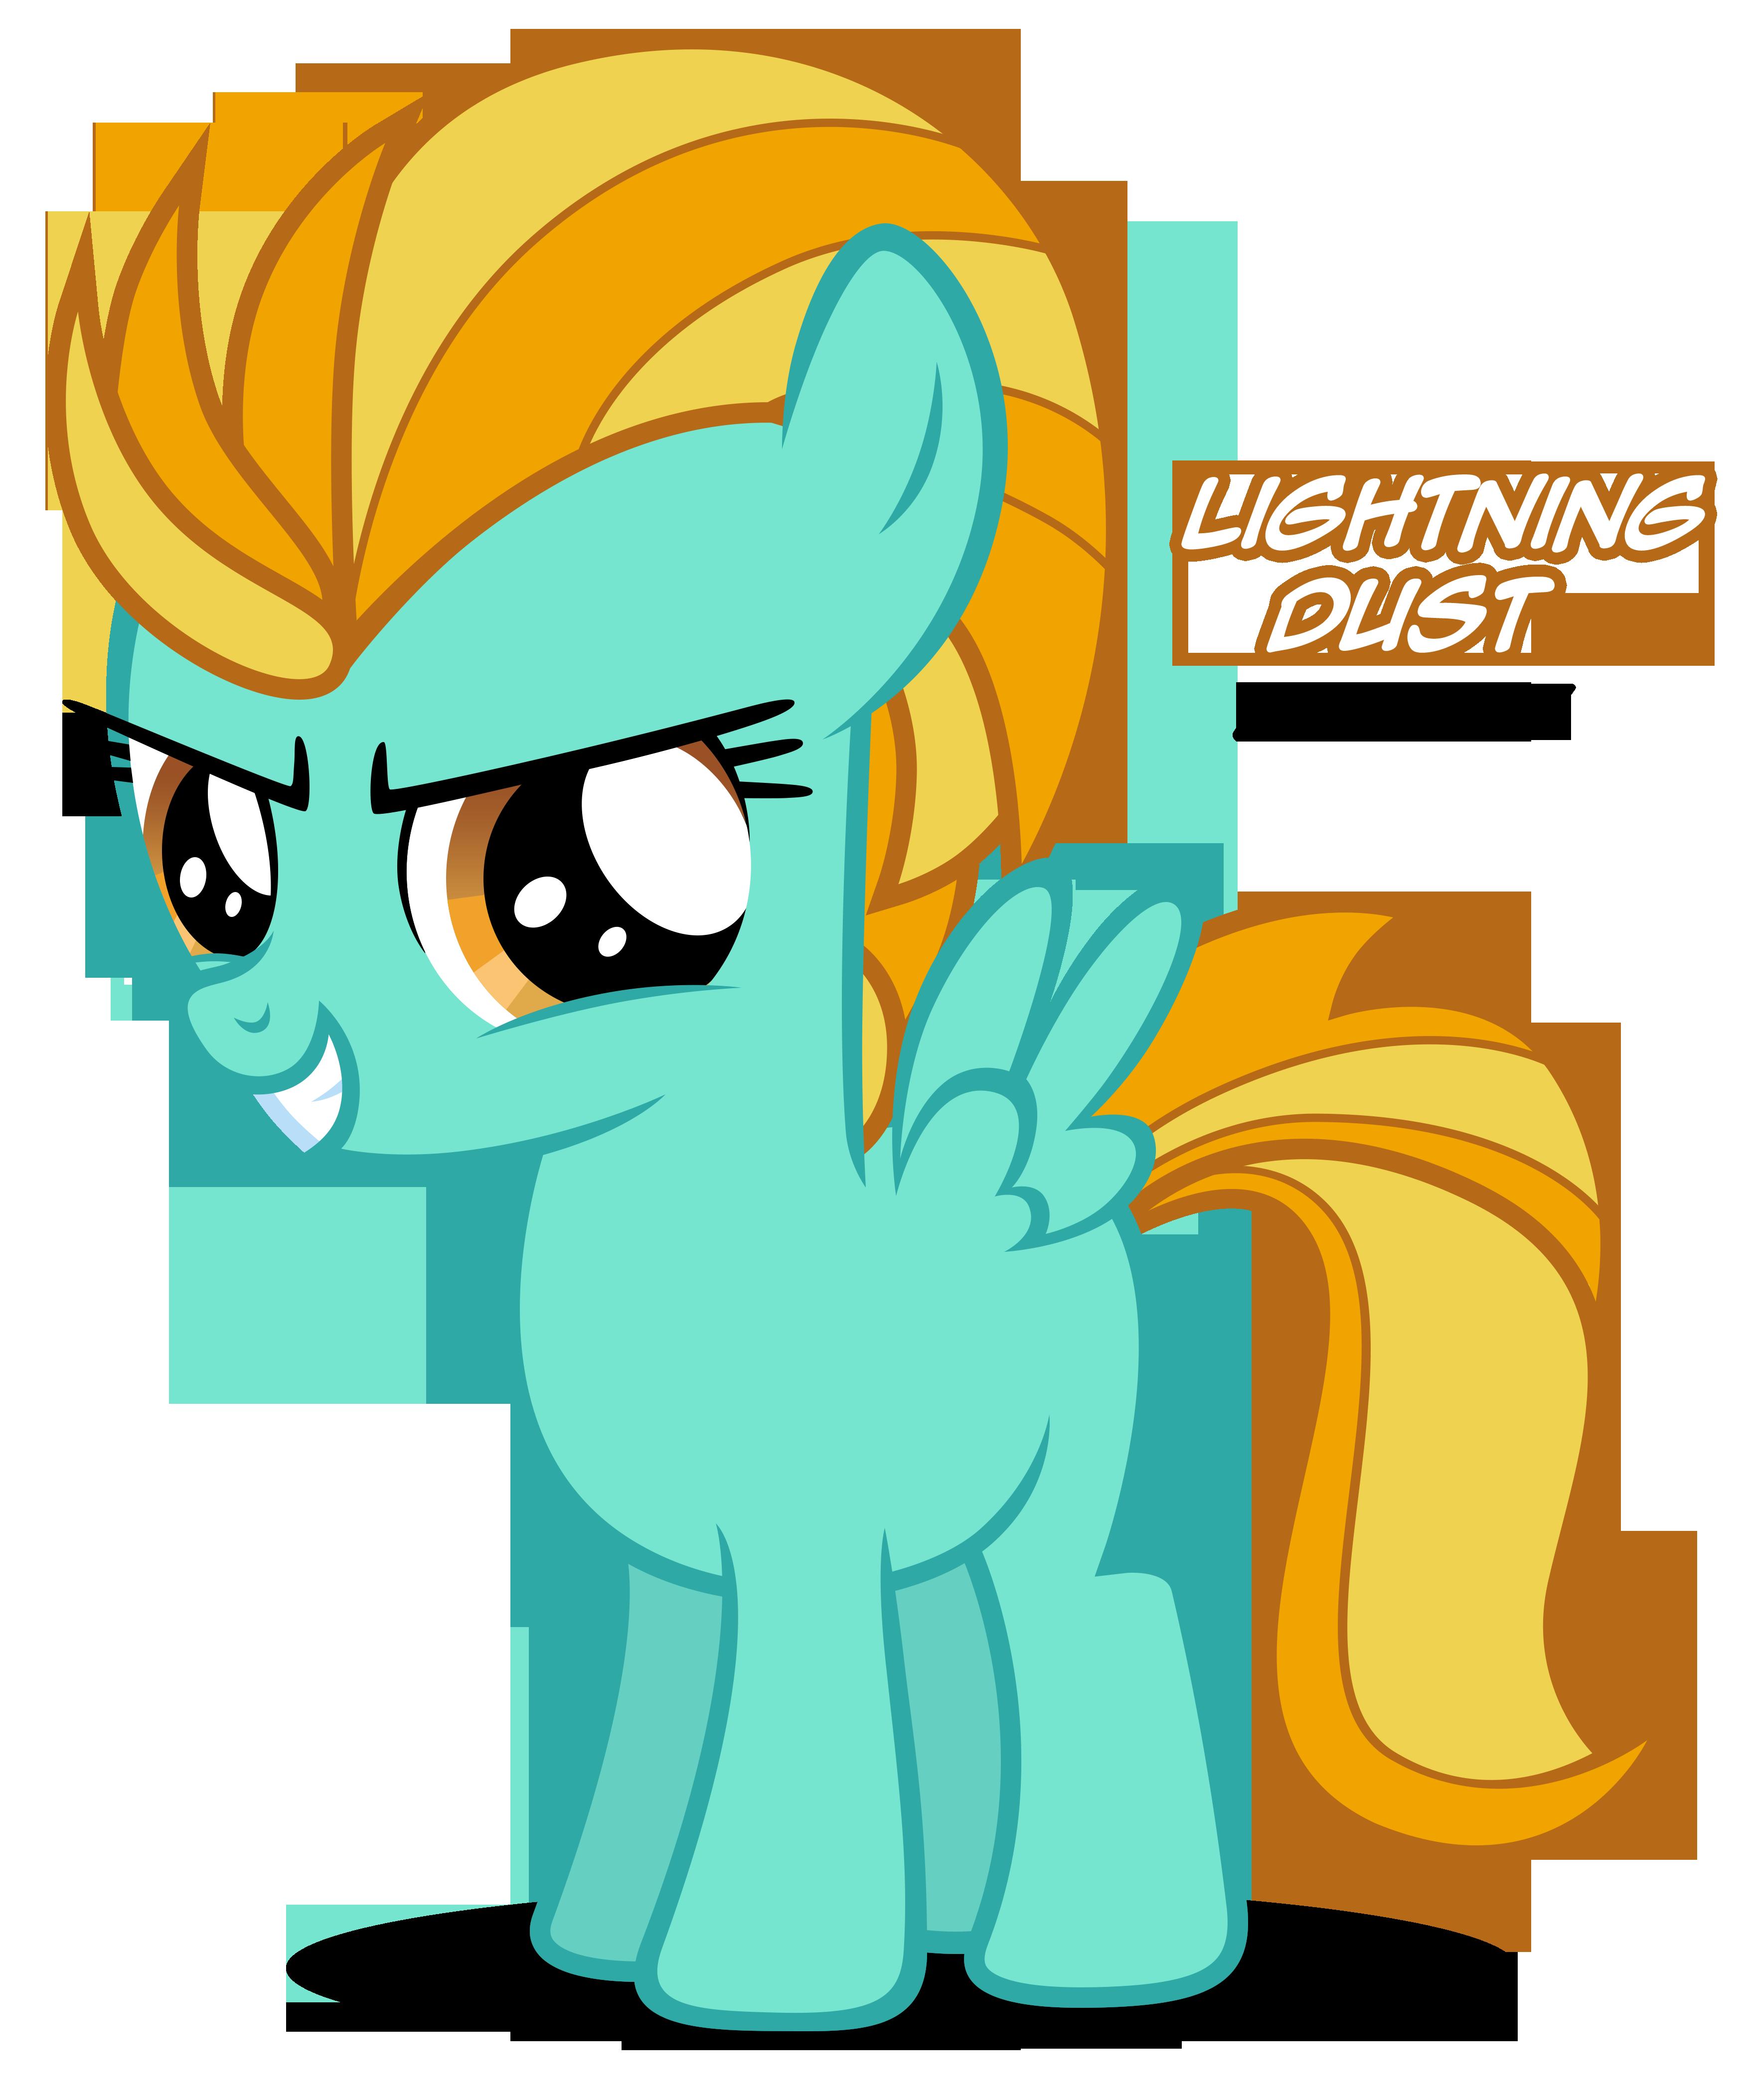 Výsledek obrázku pro mlp lightning dust